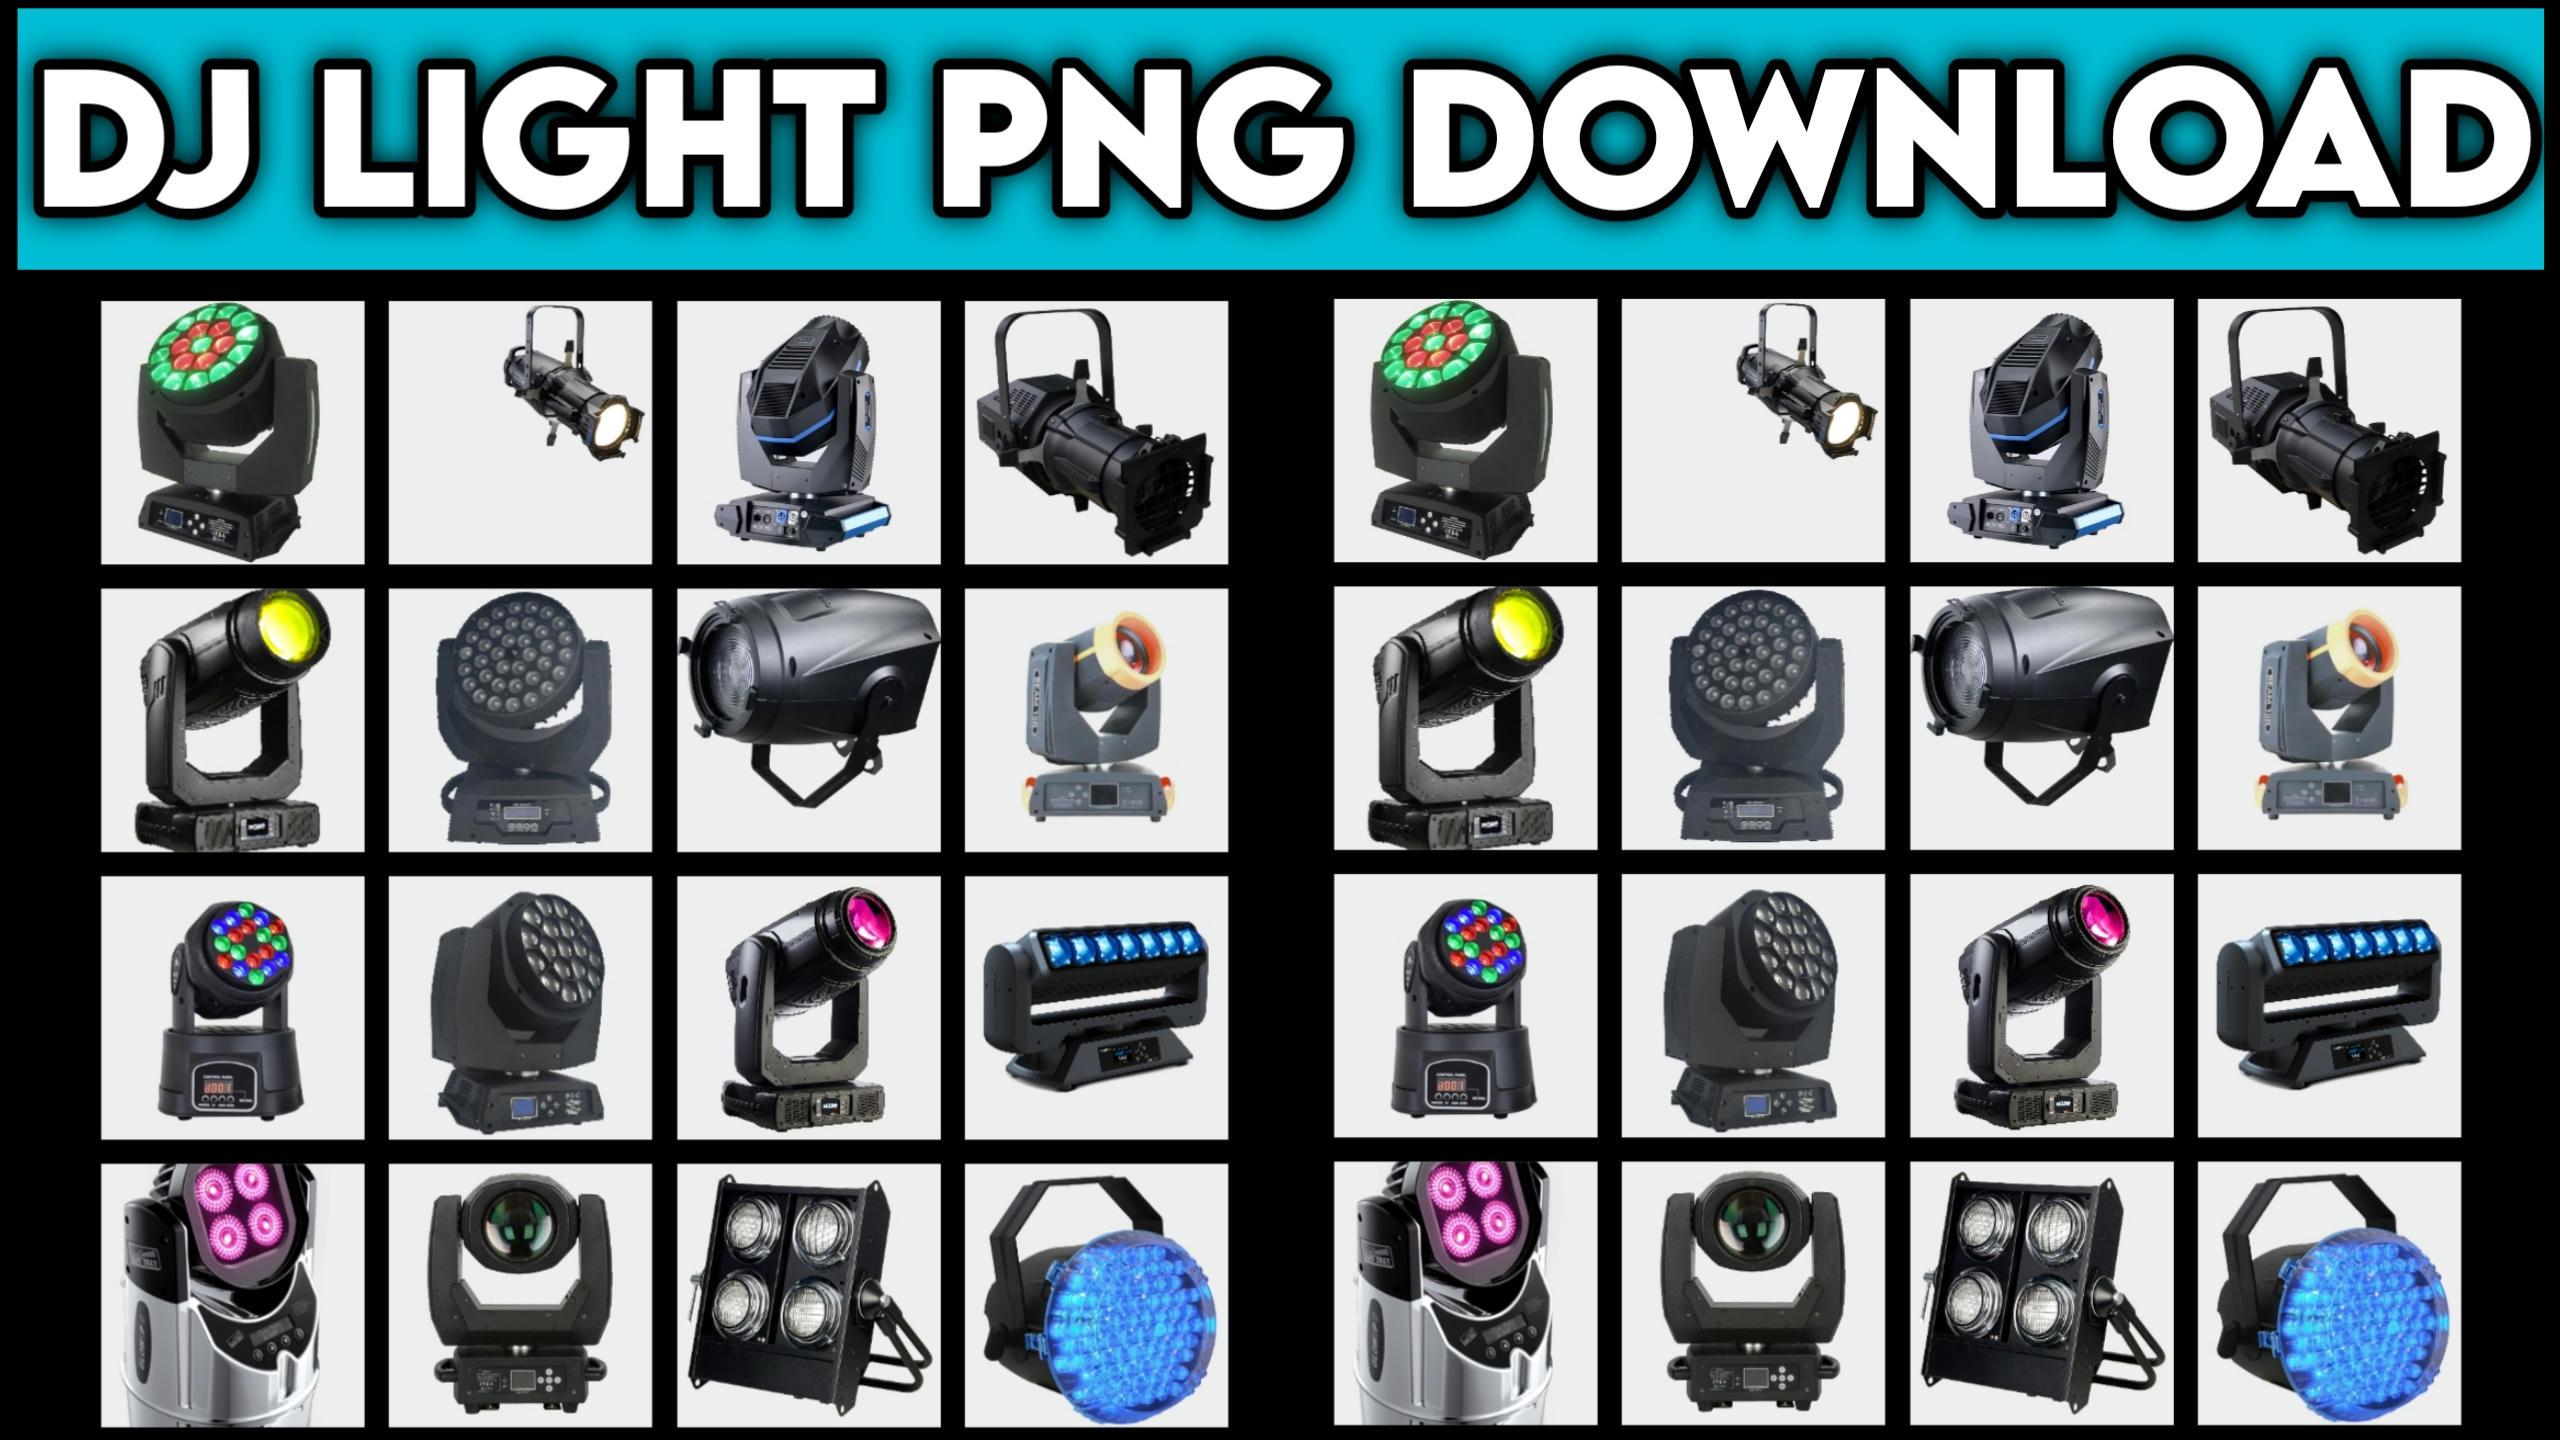 Top Dj Light Png 20 Download Free By Dj Devraj Kasya